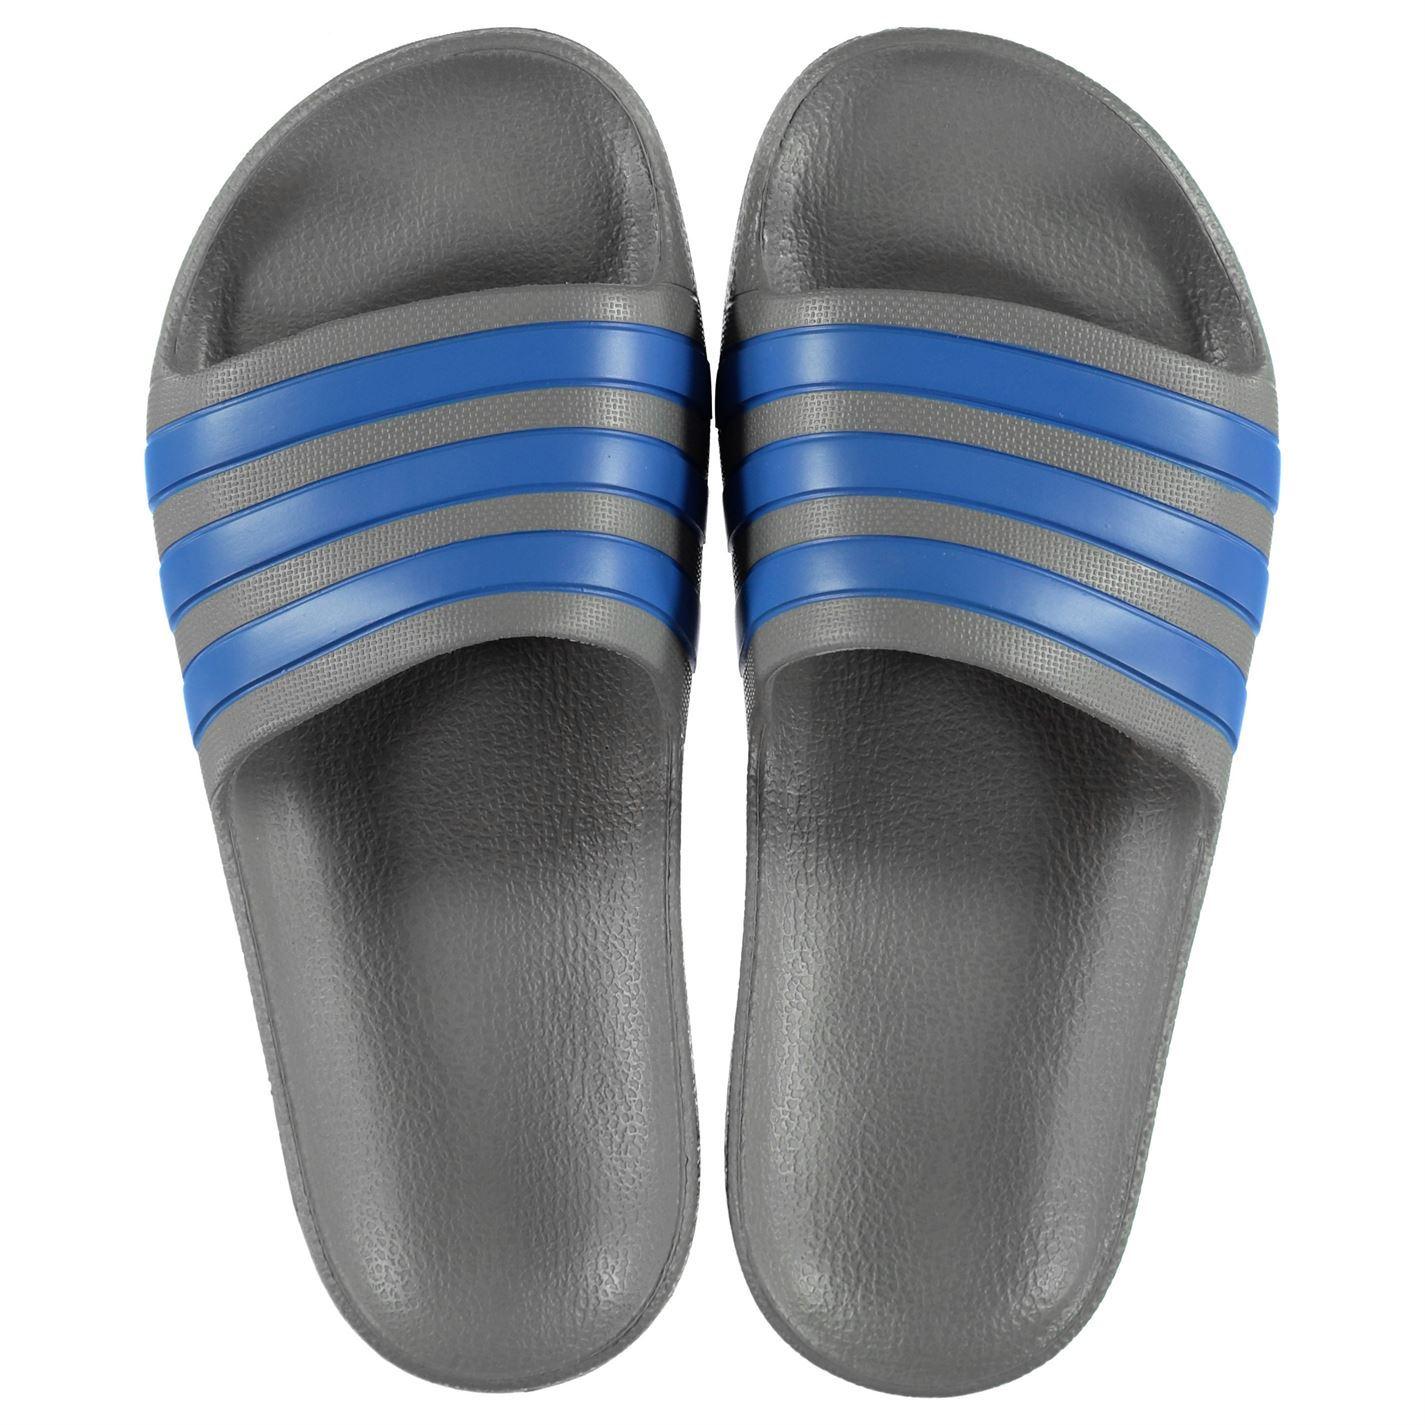 miniatura 15 - ADIDAS-Duramo-Slide-Piscina-Scarpe-Bambino-Ragazzo-Sandali-Infradito-Spiaggia-Scarpe-Thongs